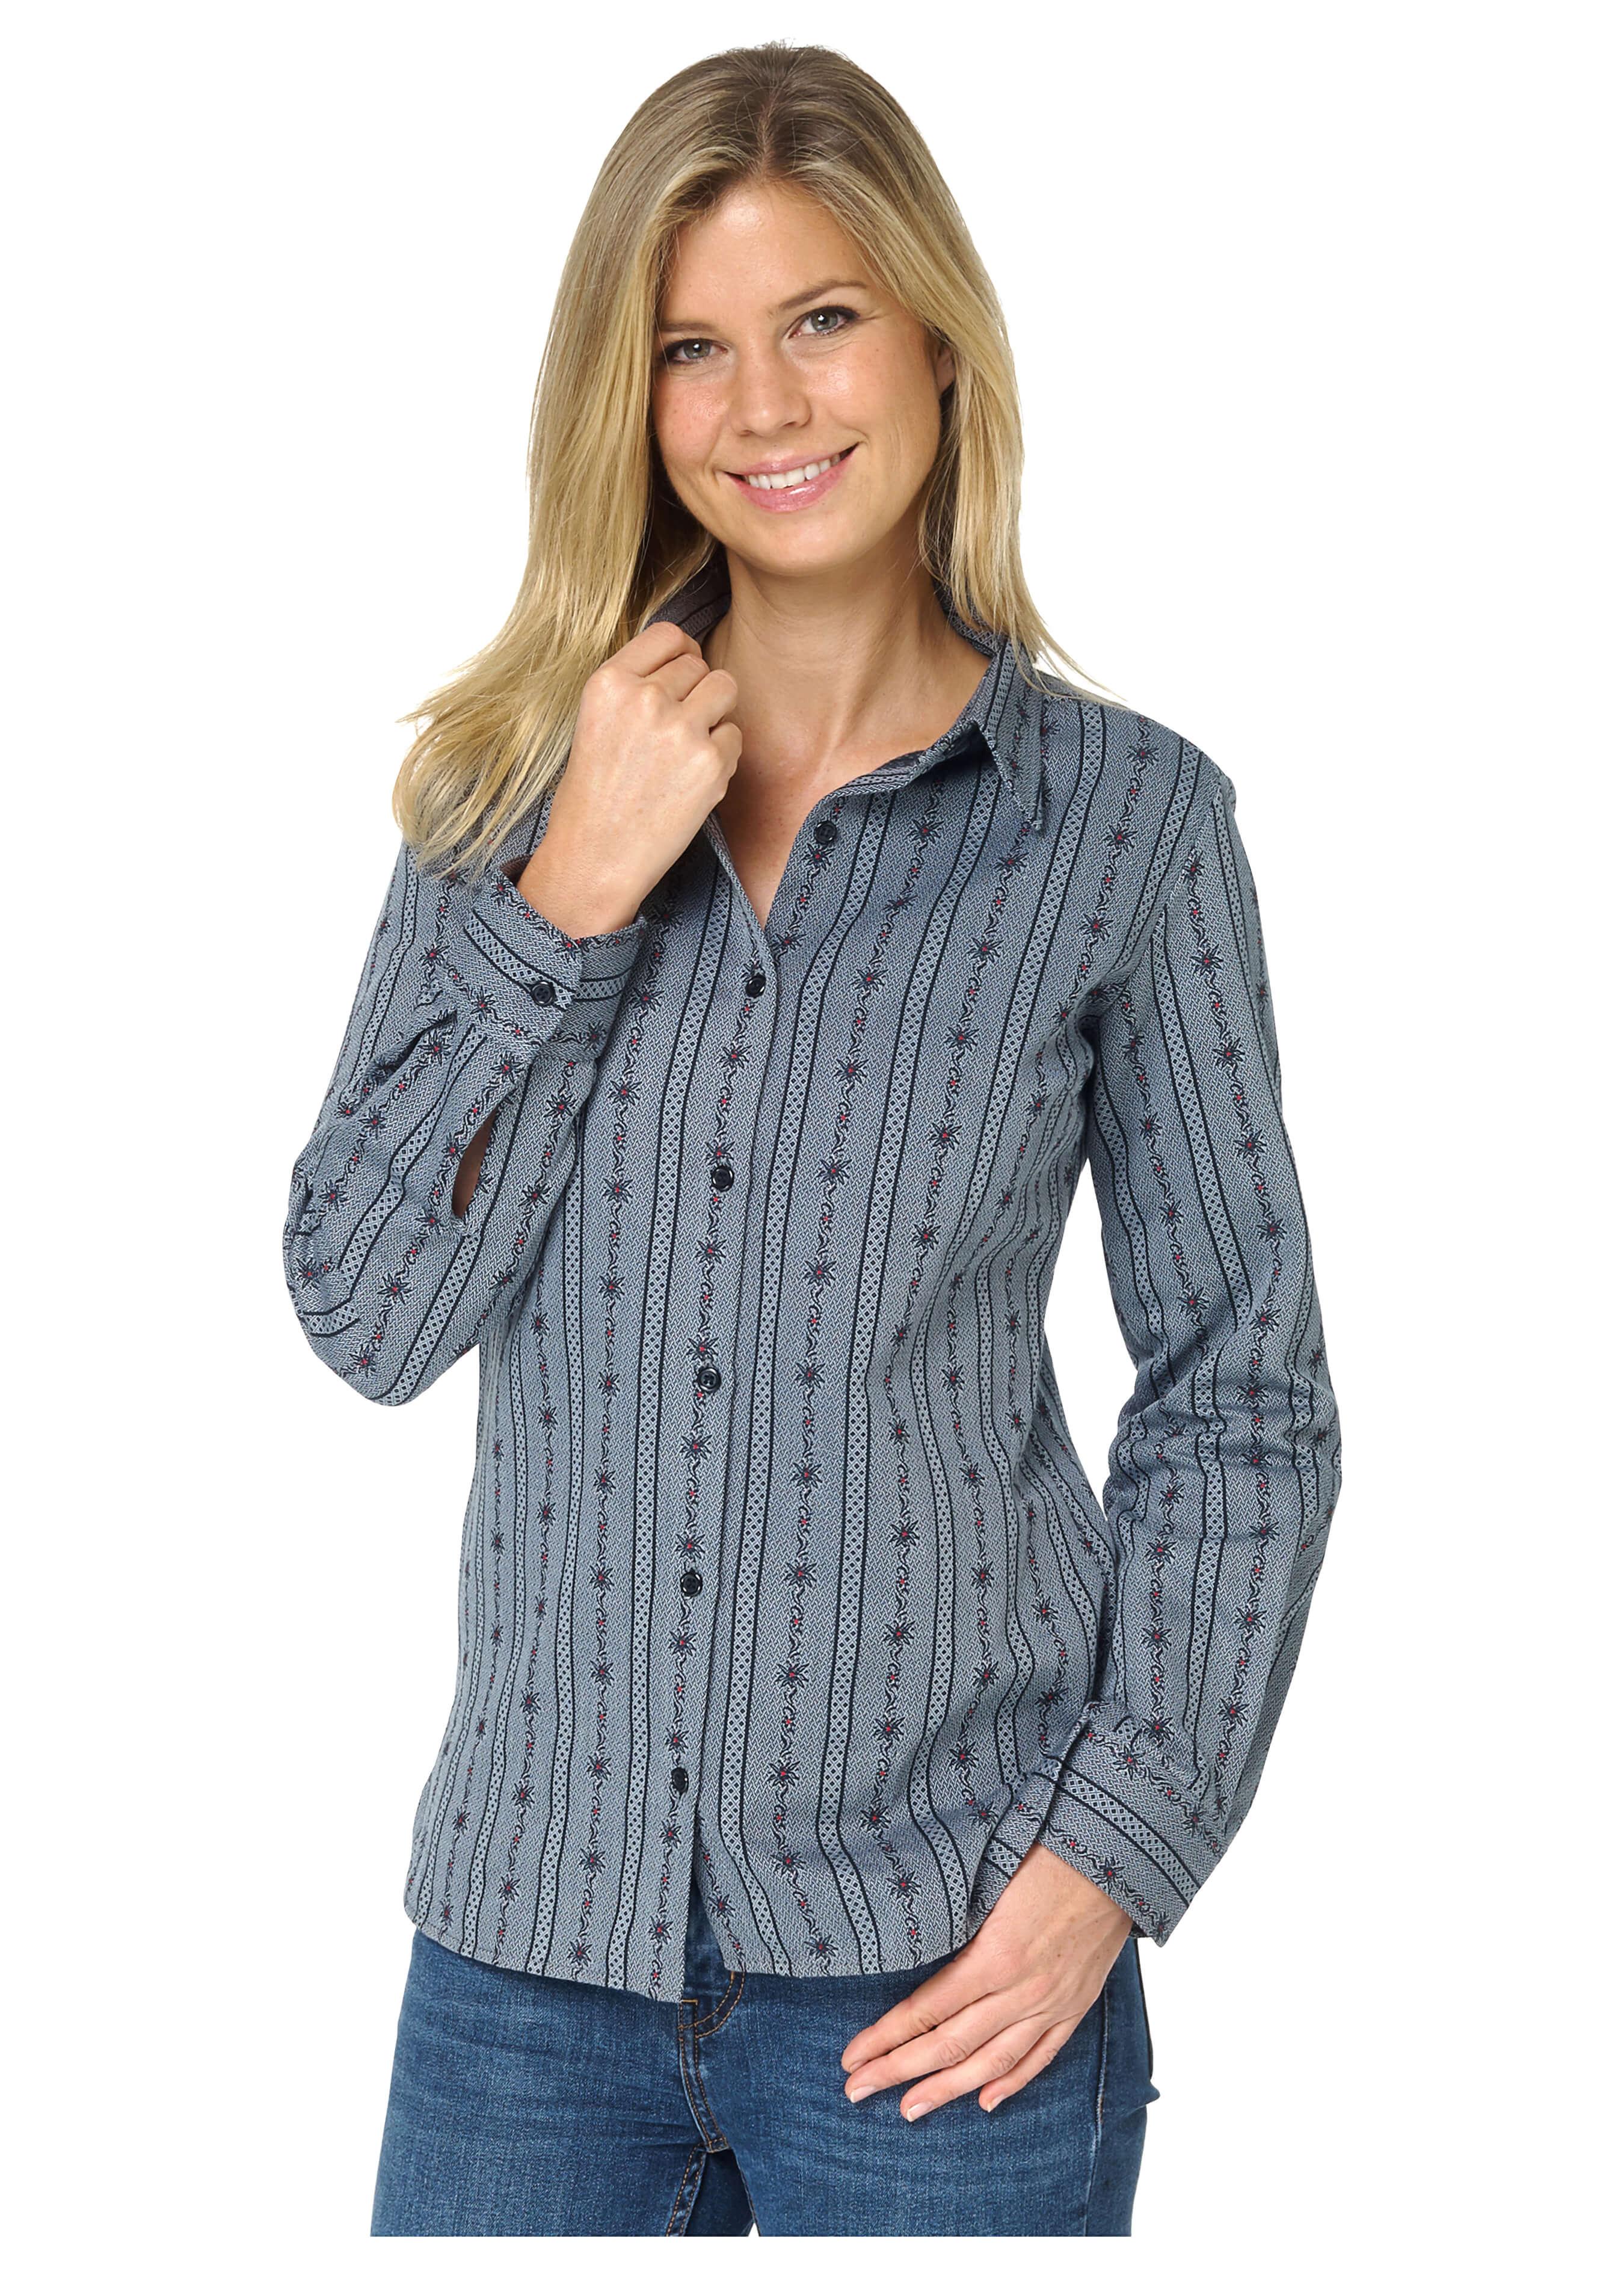 Damen Edelweiss Bluse mit geradem Saum 272812L 1